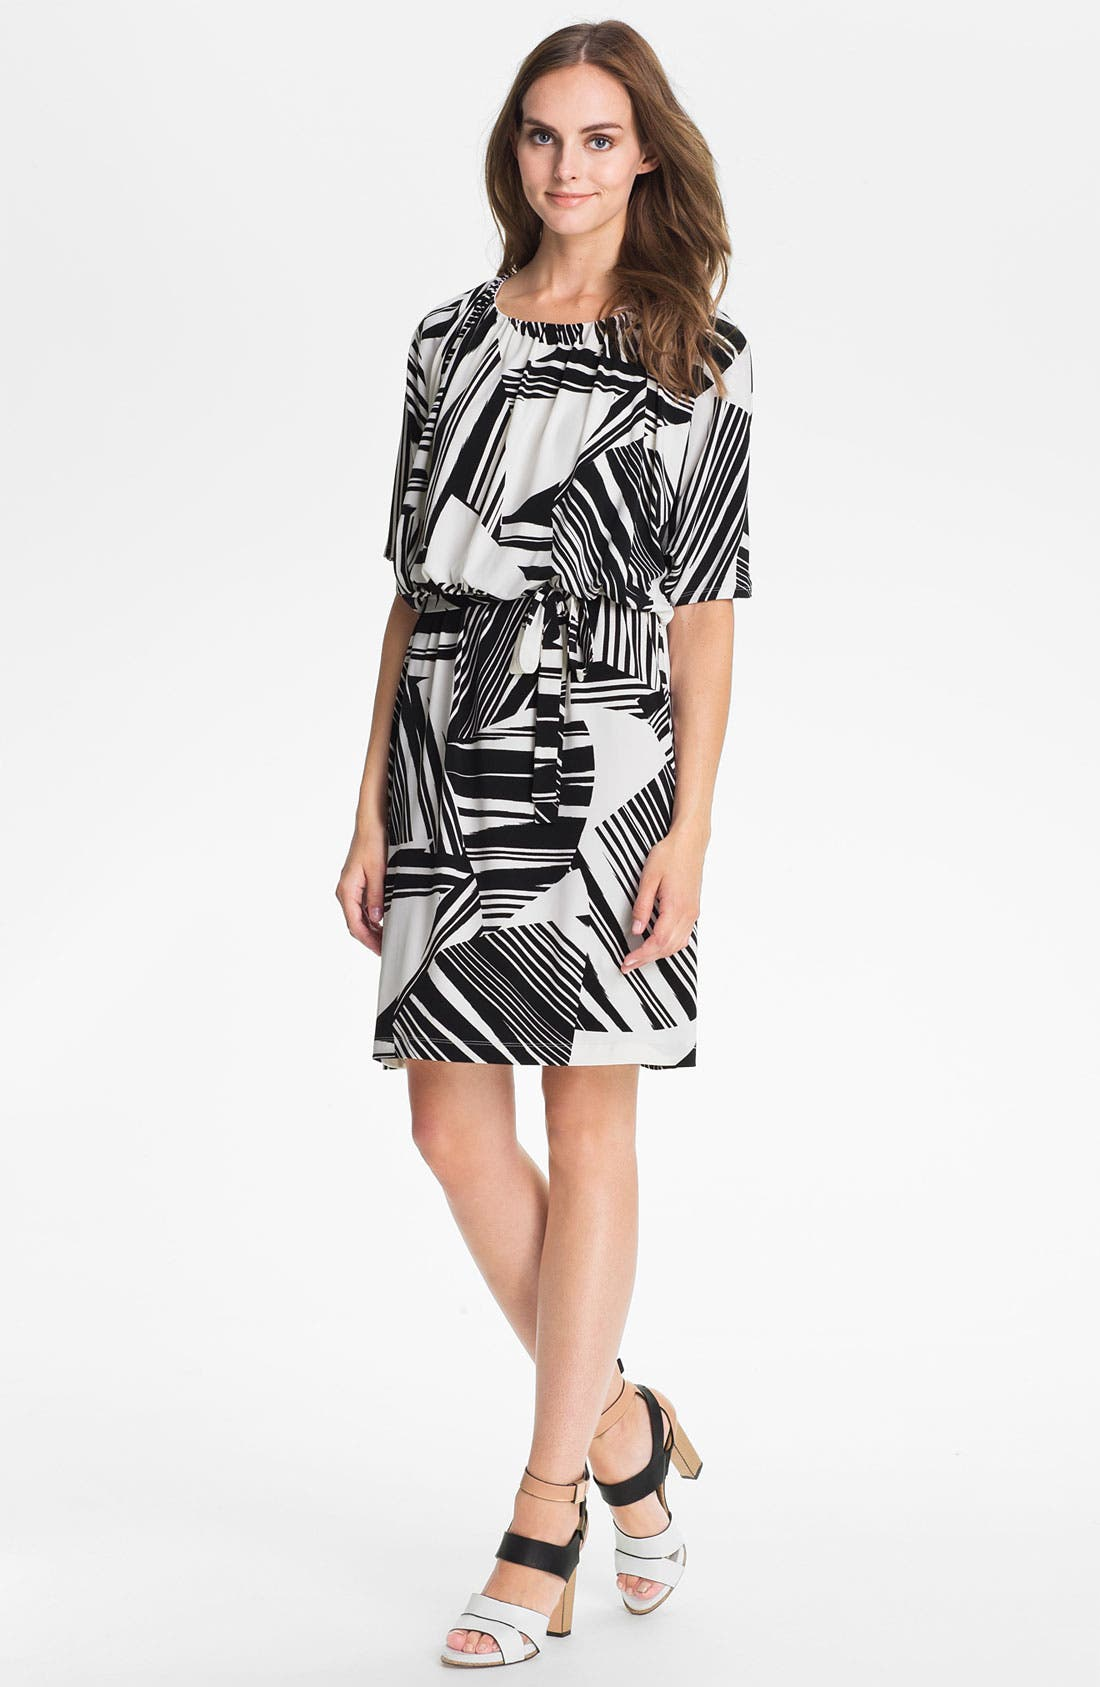 Main Image - Suzi Chin for Maggy Boutique Print Blouson Dress